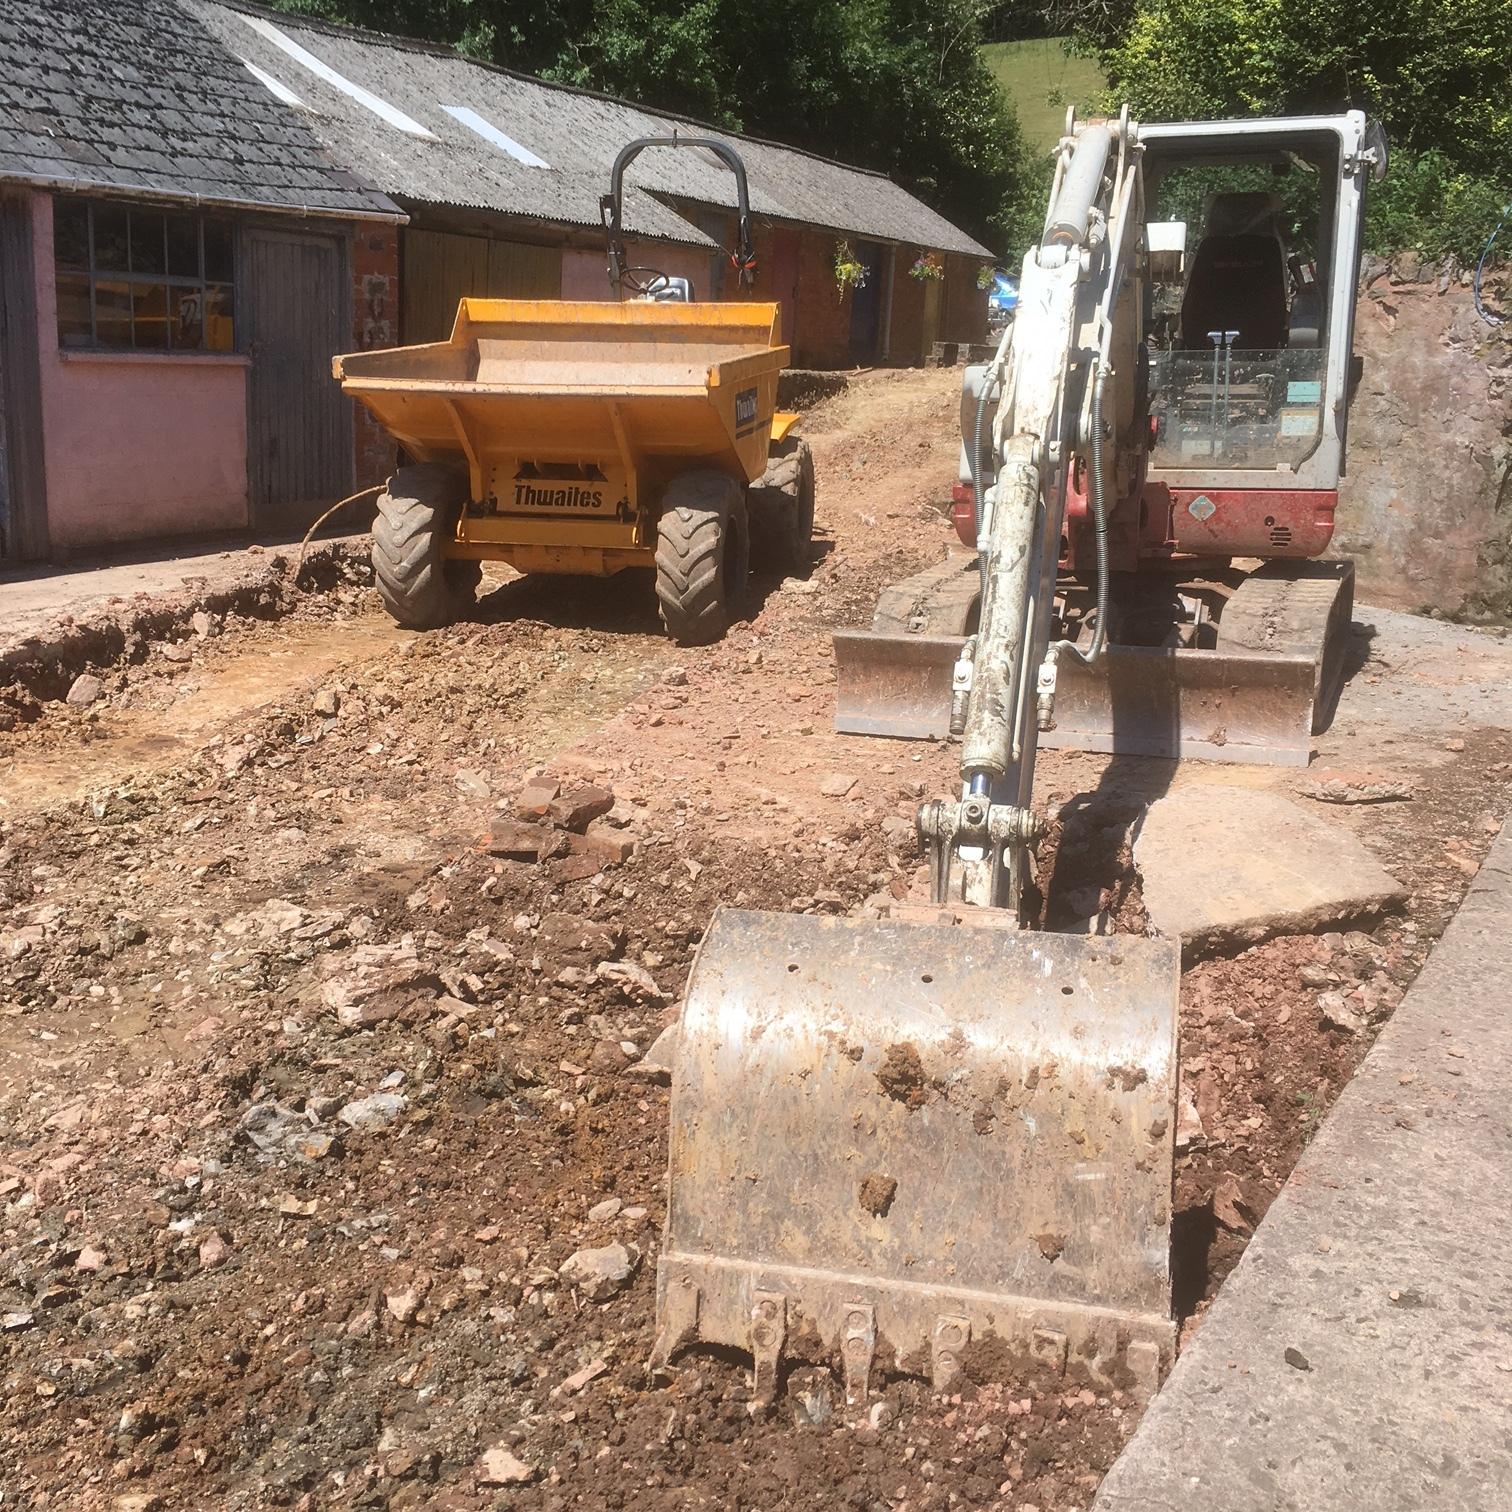 Hurstone, Somerset renovation work has begun